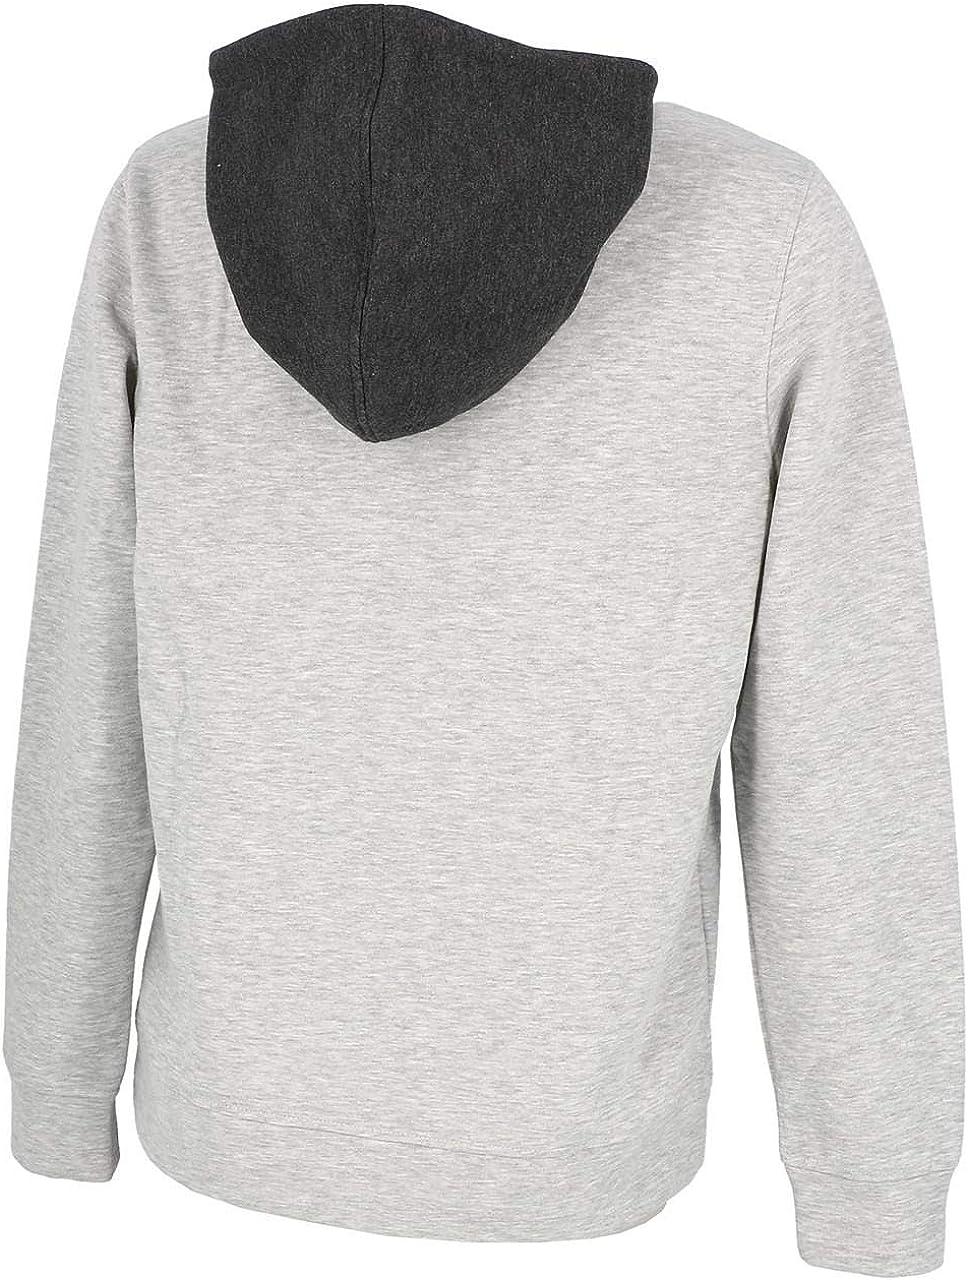 Jack /& Jones Jcofund Sweat Hood Sweatshirt /à Capuche Homme